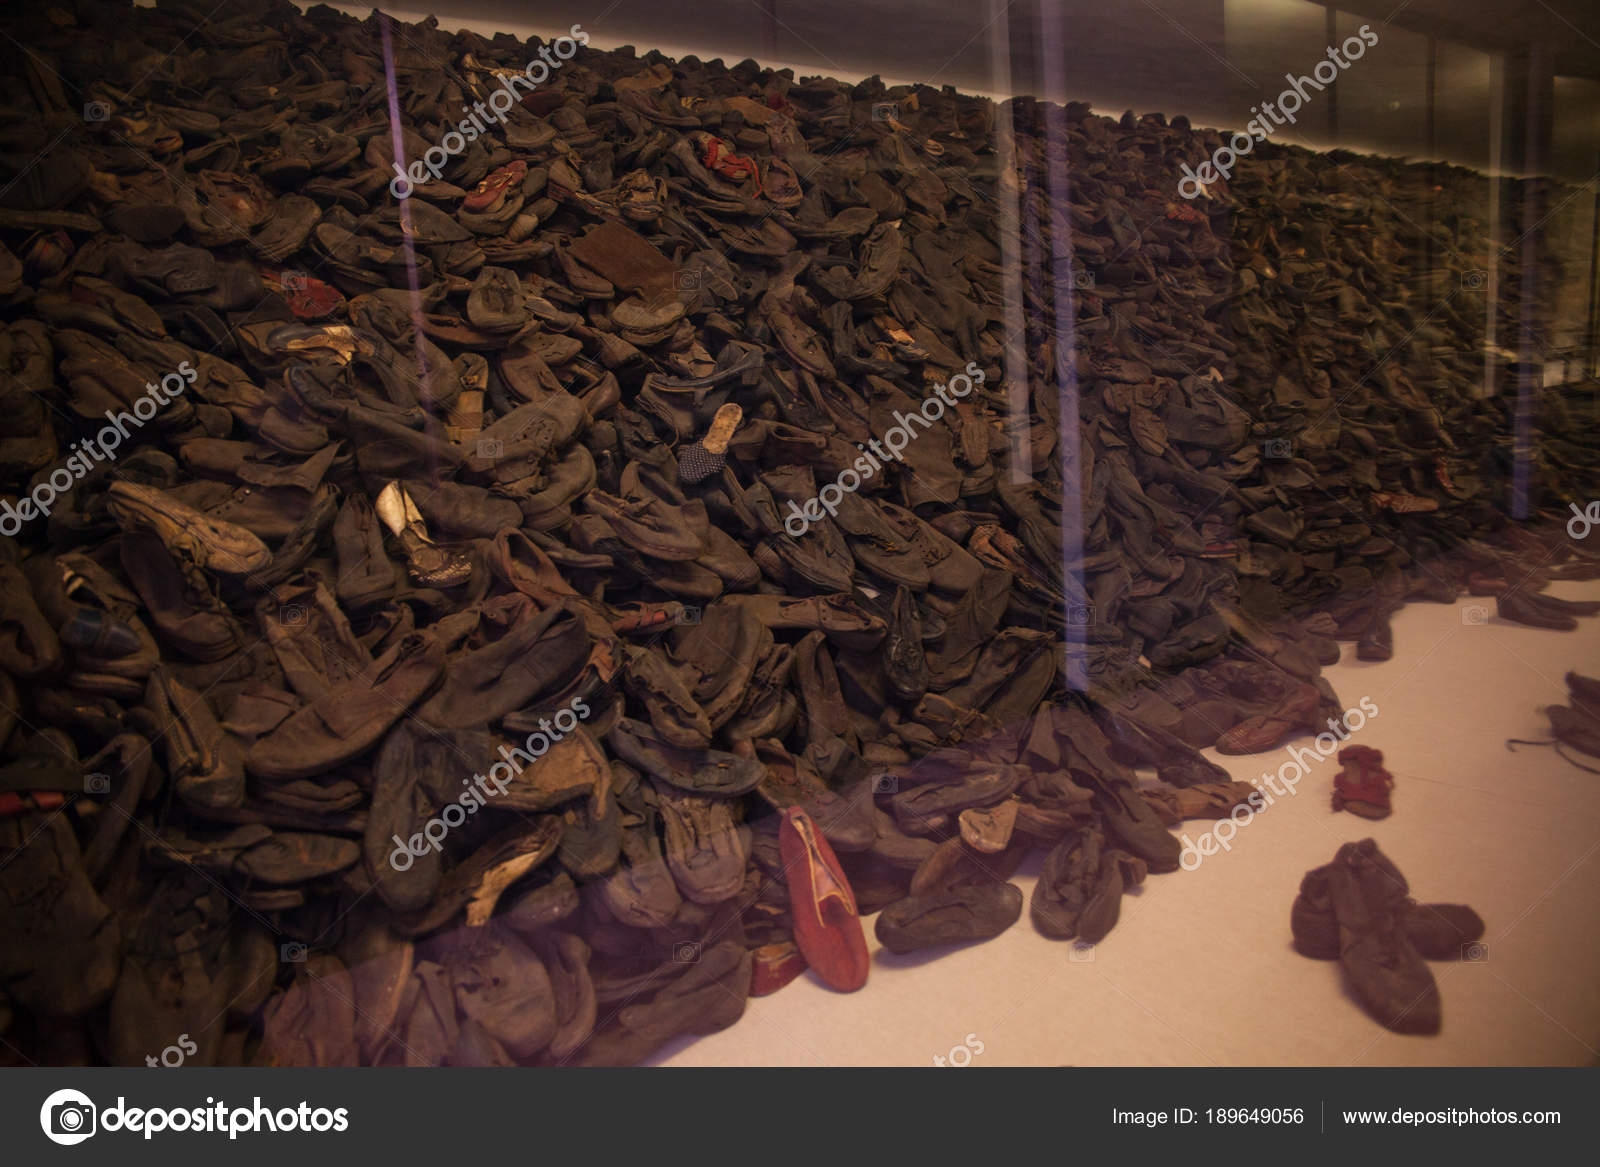 Museum Auschwitz Holocaust Memorial Museum Stacks Shoes